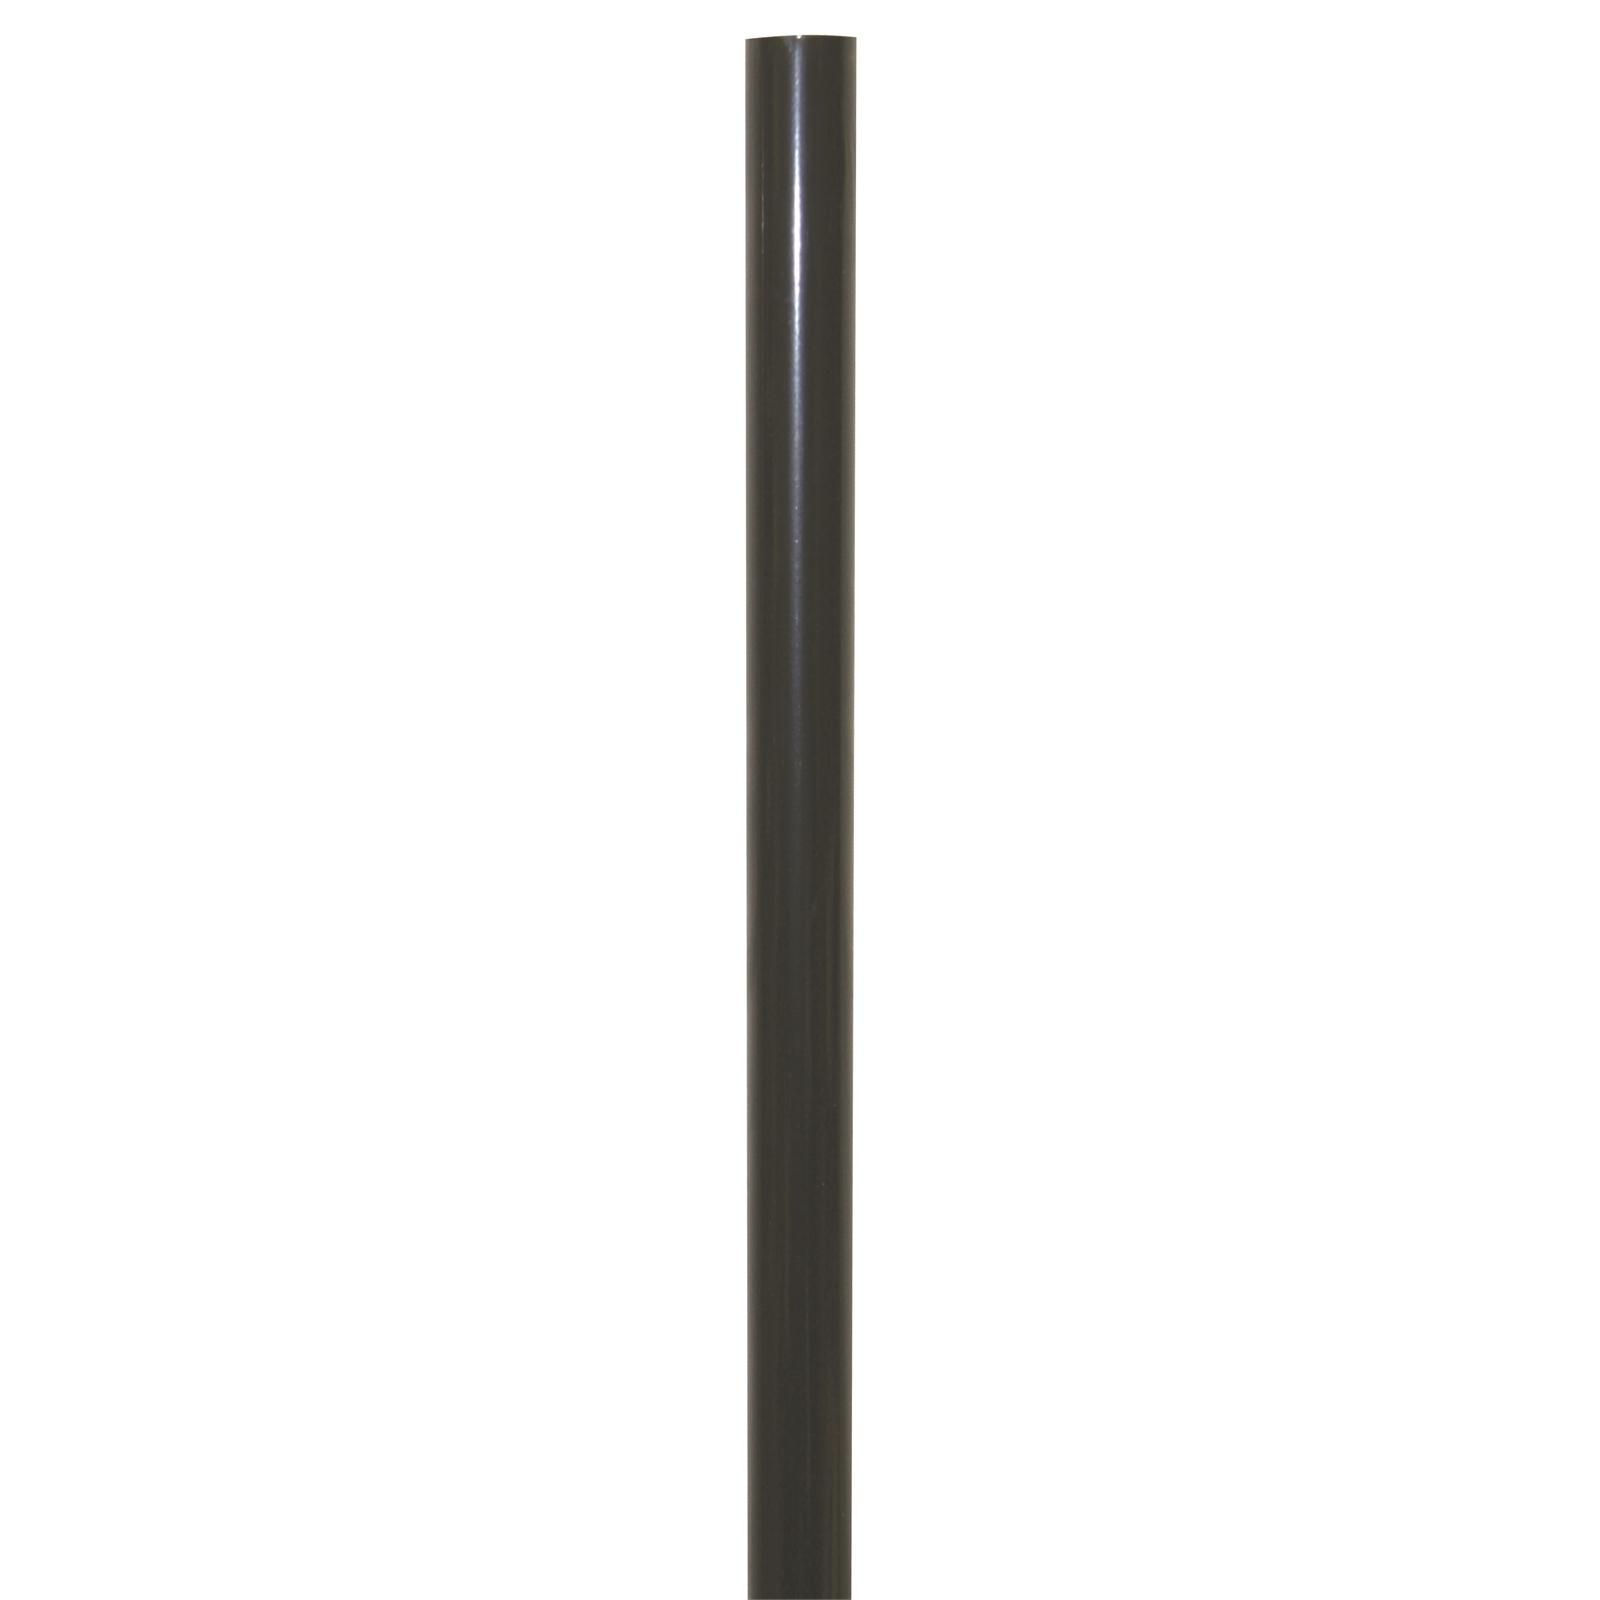 Windoware Curtain Rod 19mm x 2.0m Wrought Iron Black